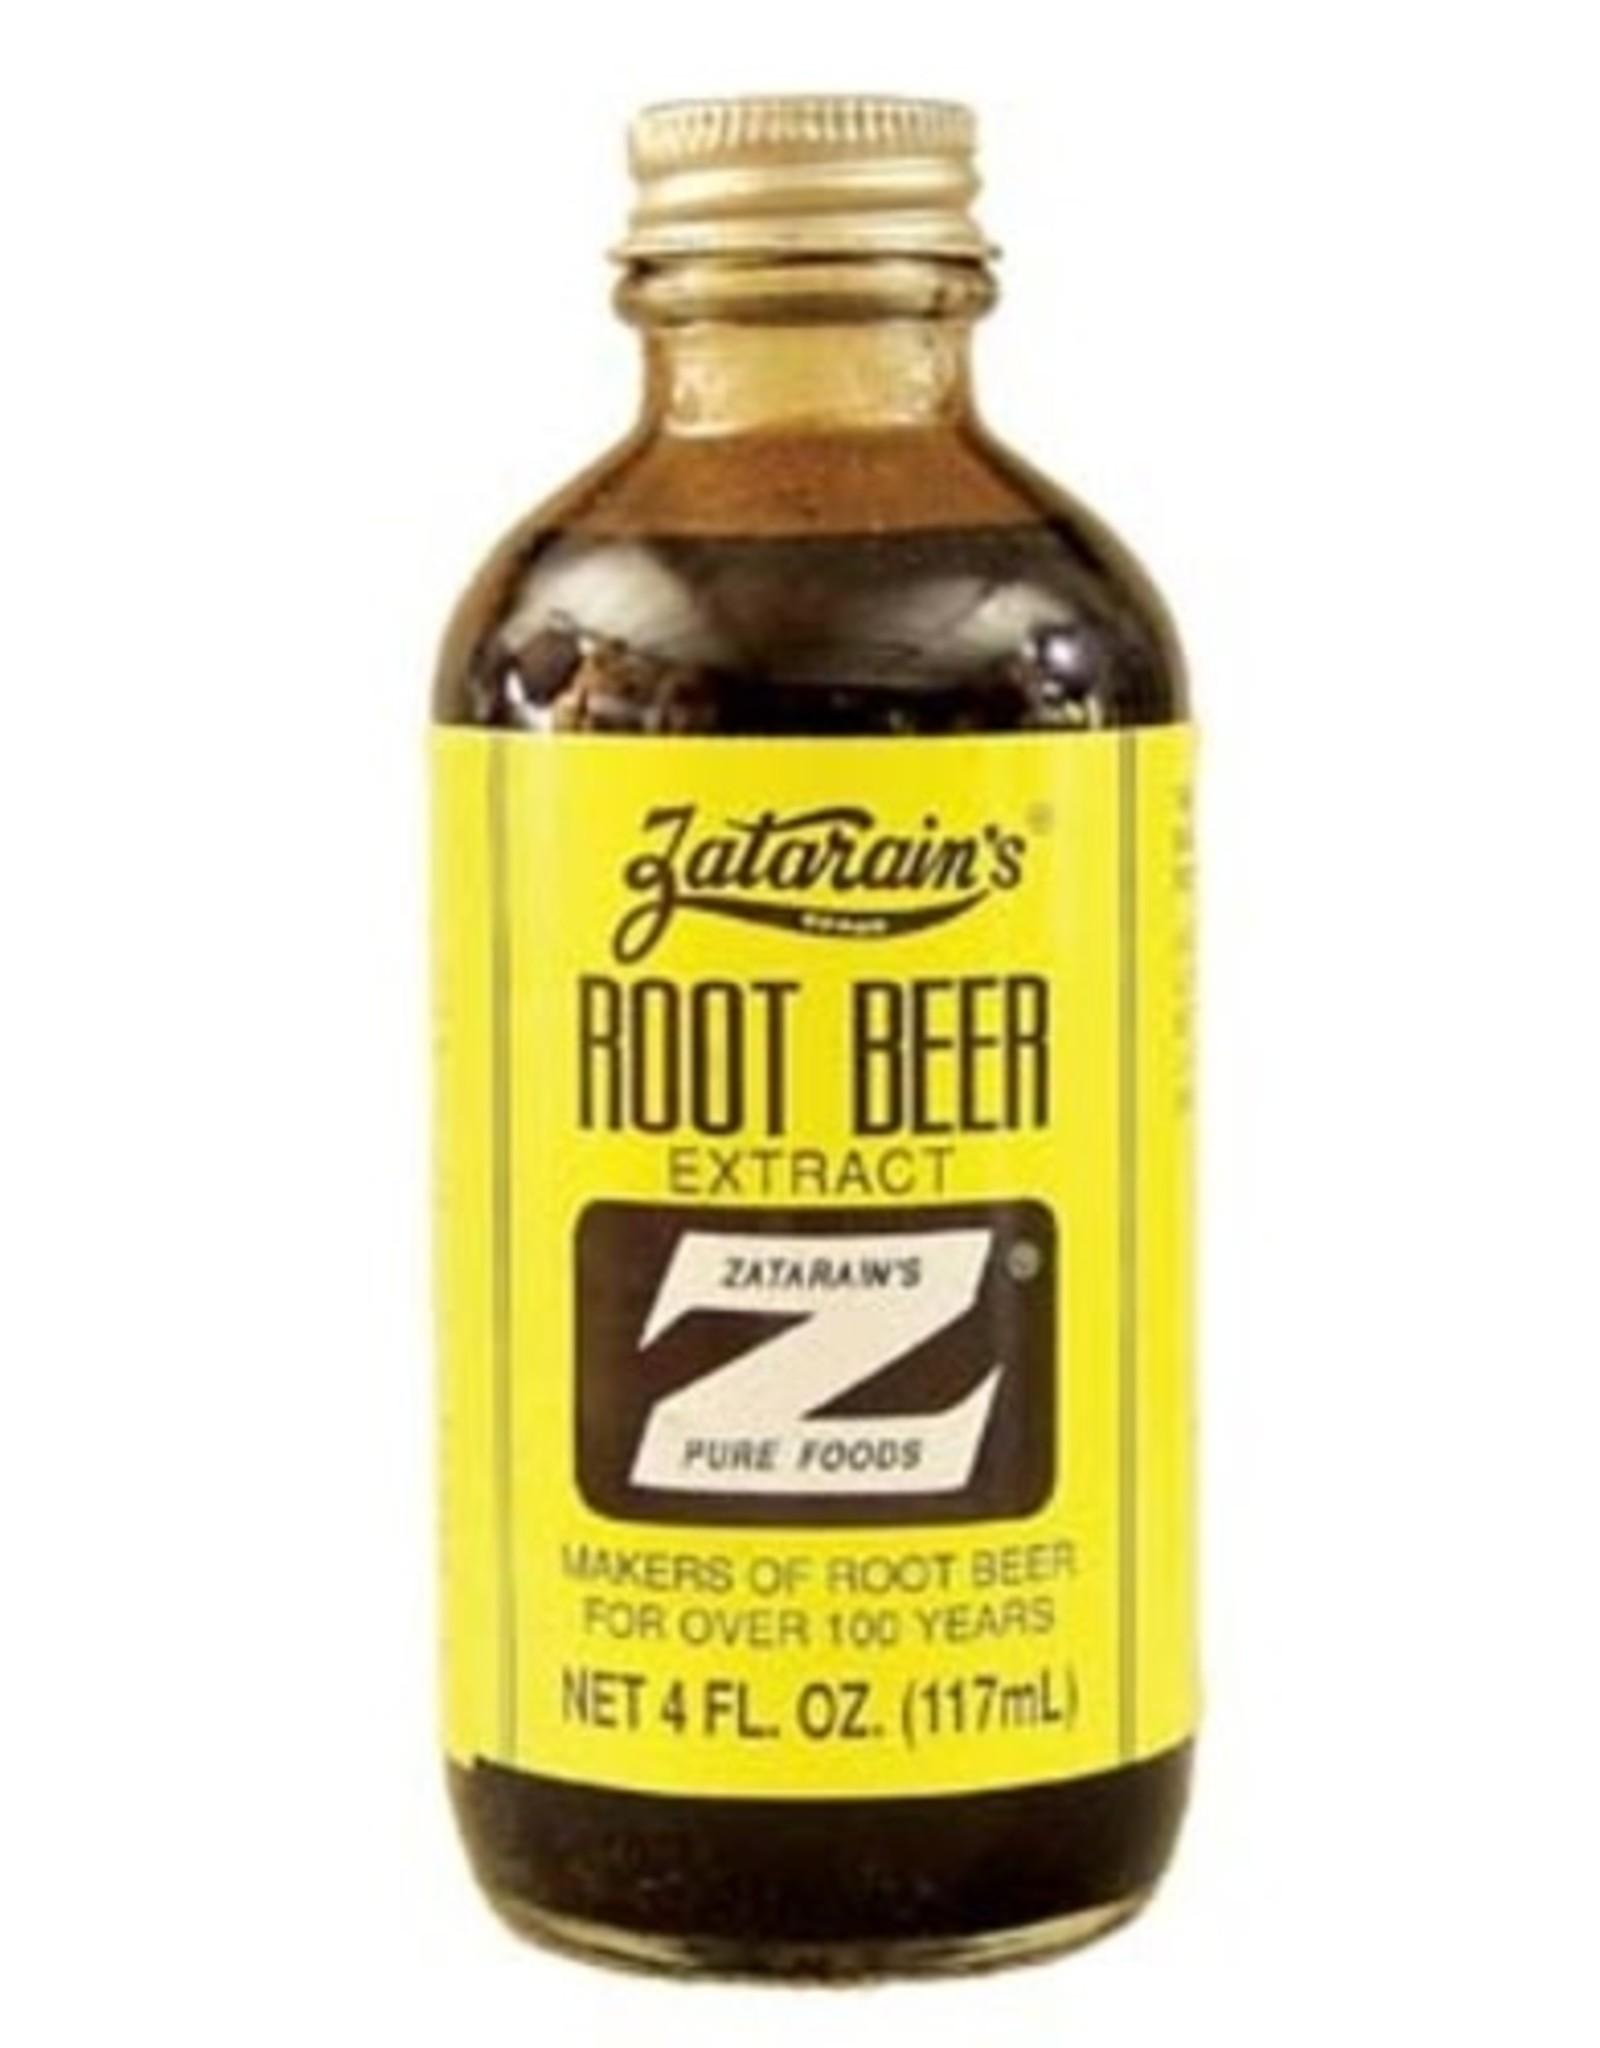 Zatarains Root Beer Extract - 4 fl oz